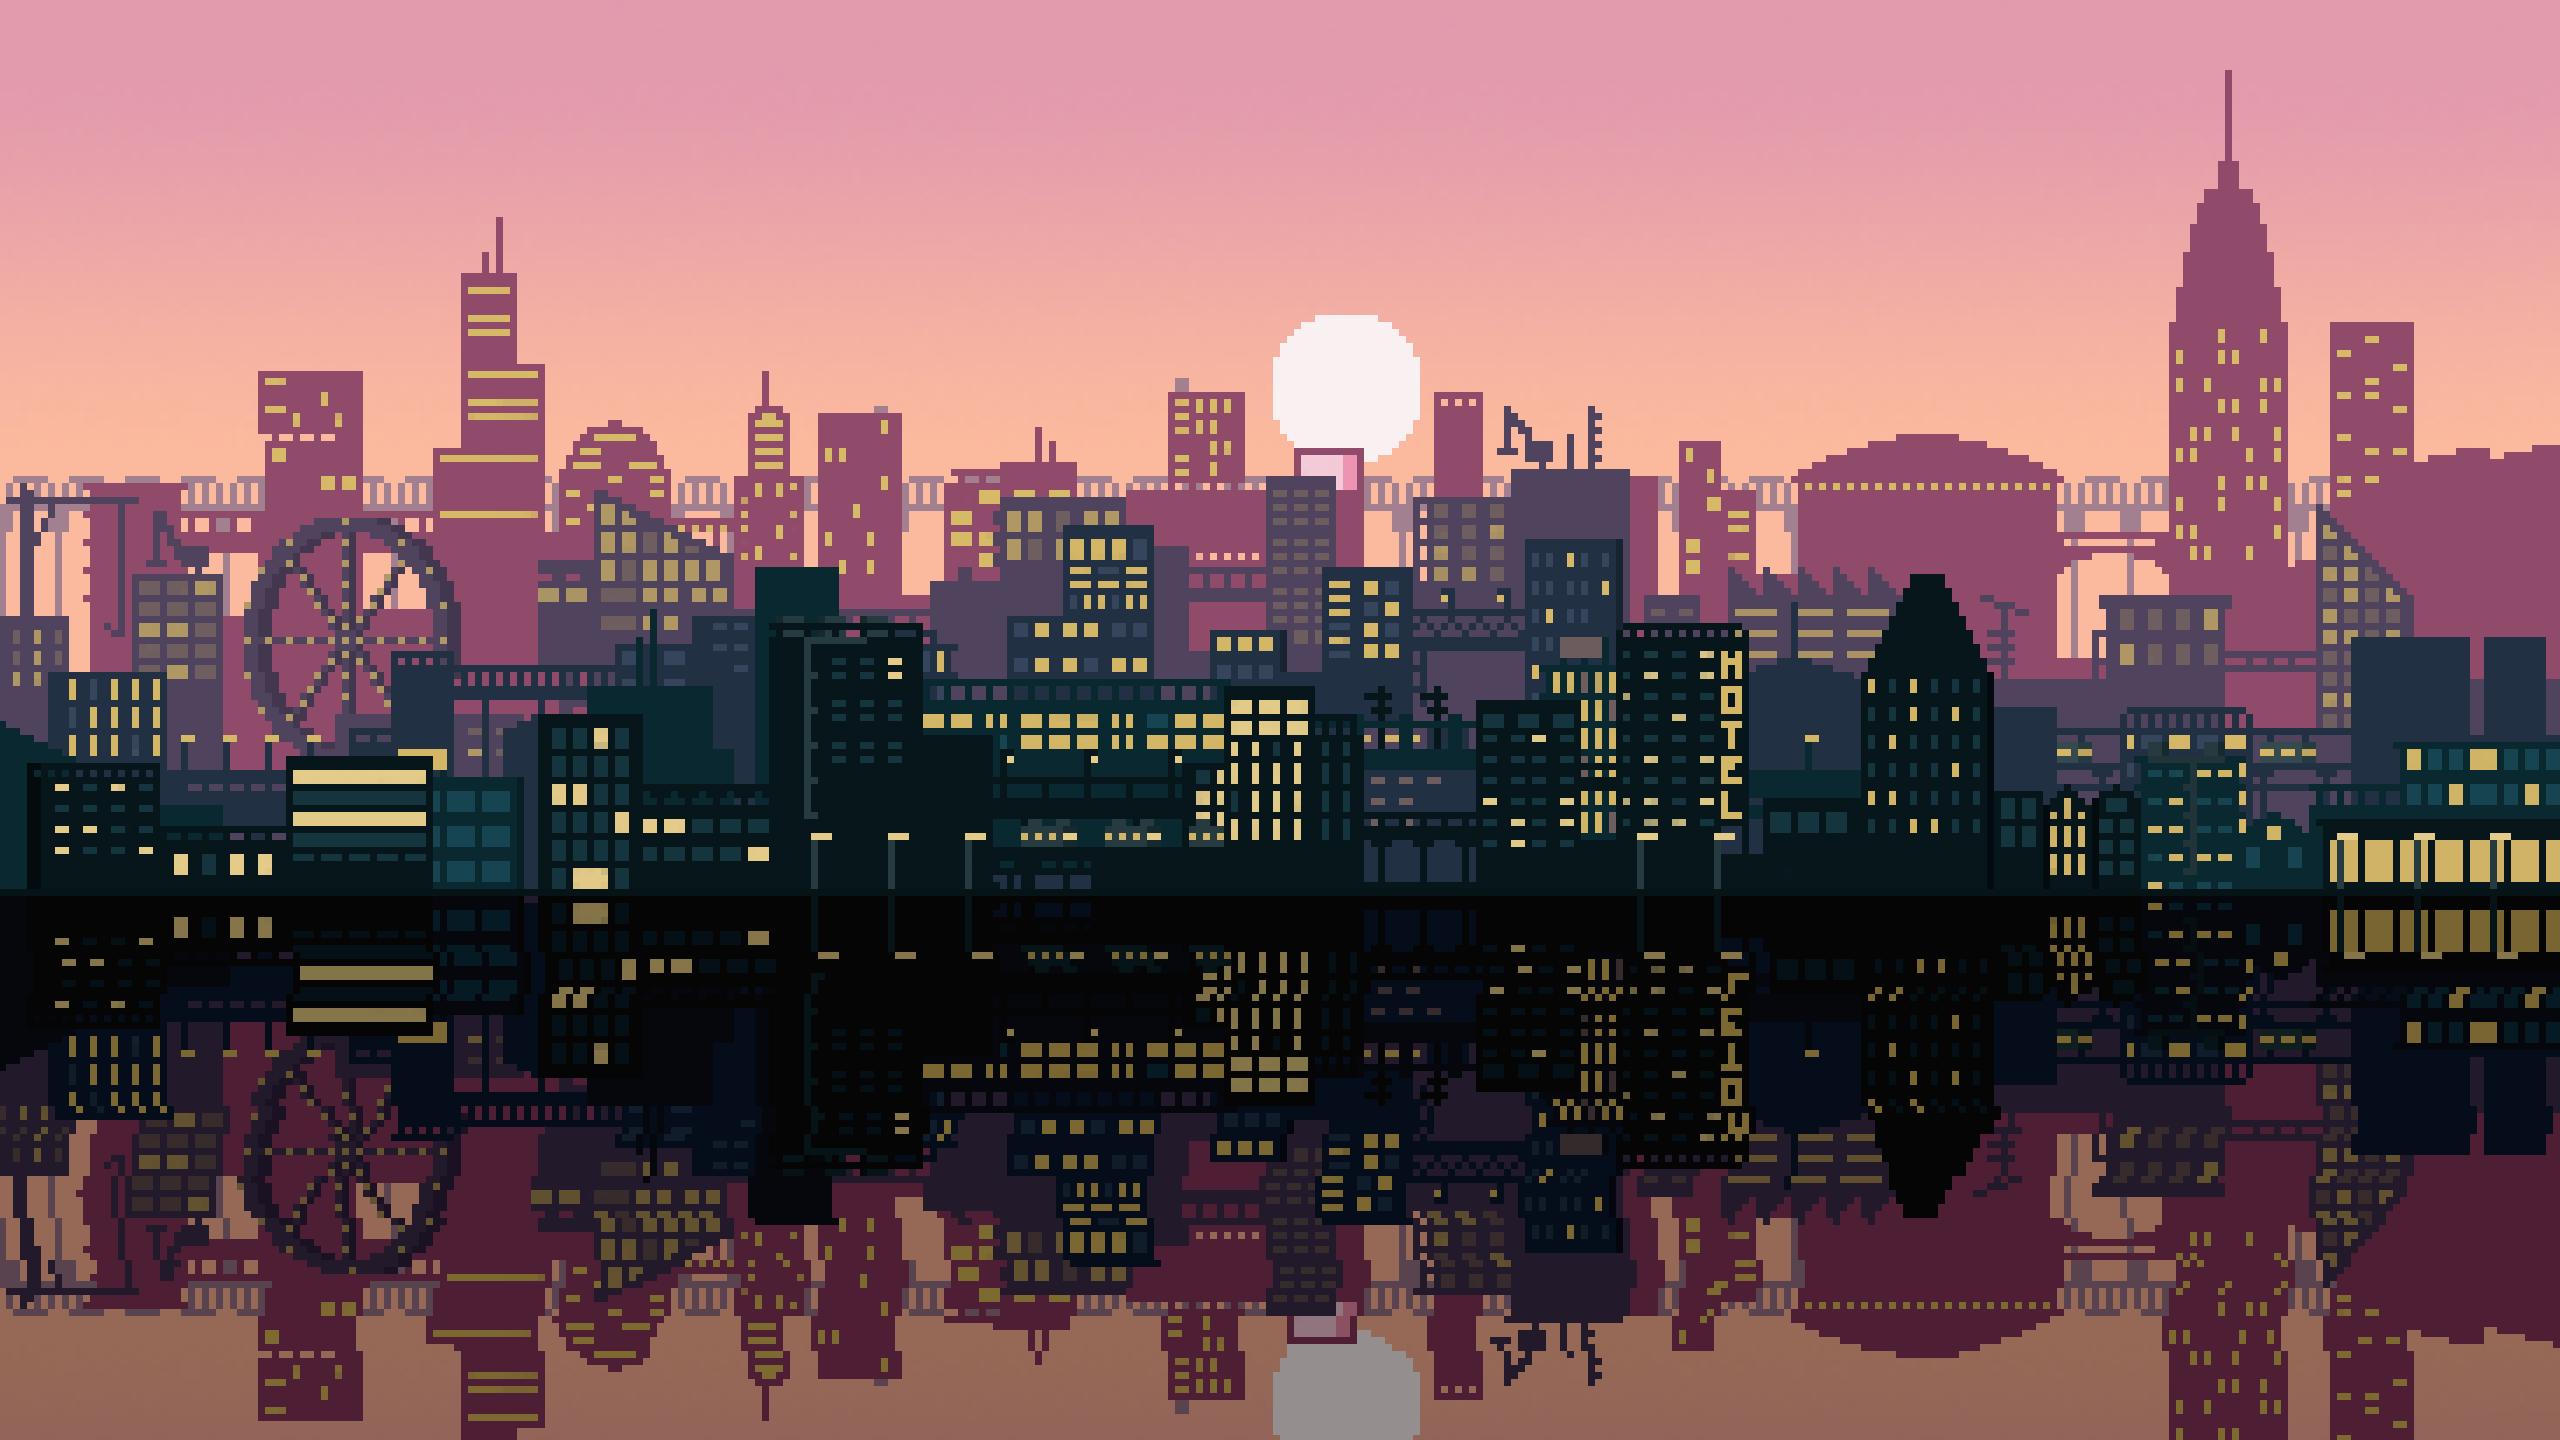 Pixel Art City 2560x1440 Oc Desktop Wallpaper Art Aesthetic Desktop Wallpaper Pixel City